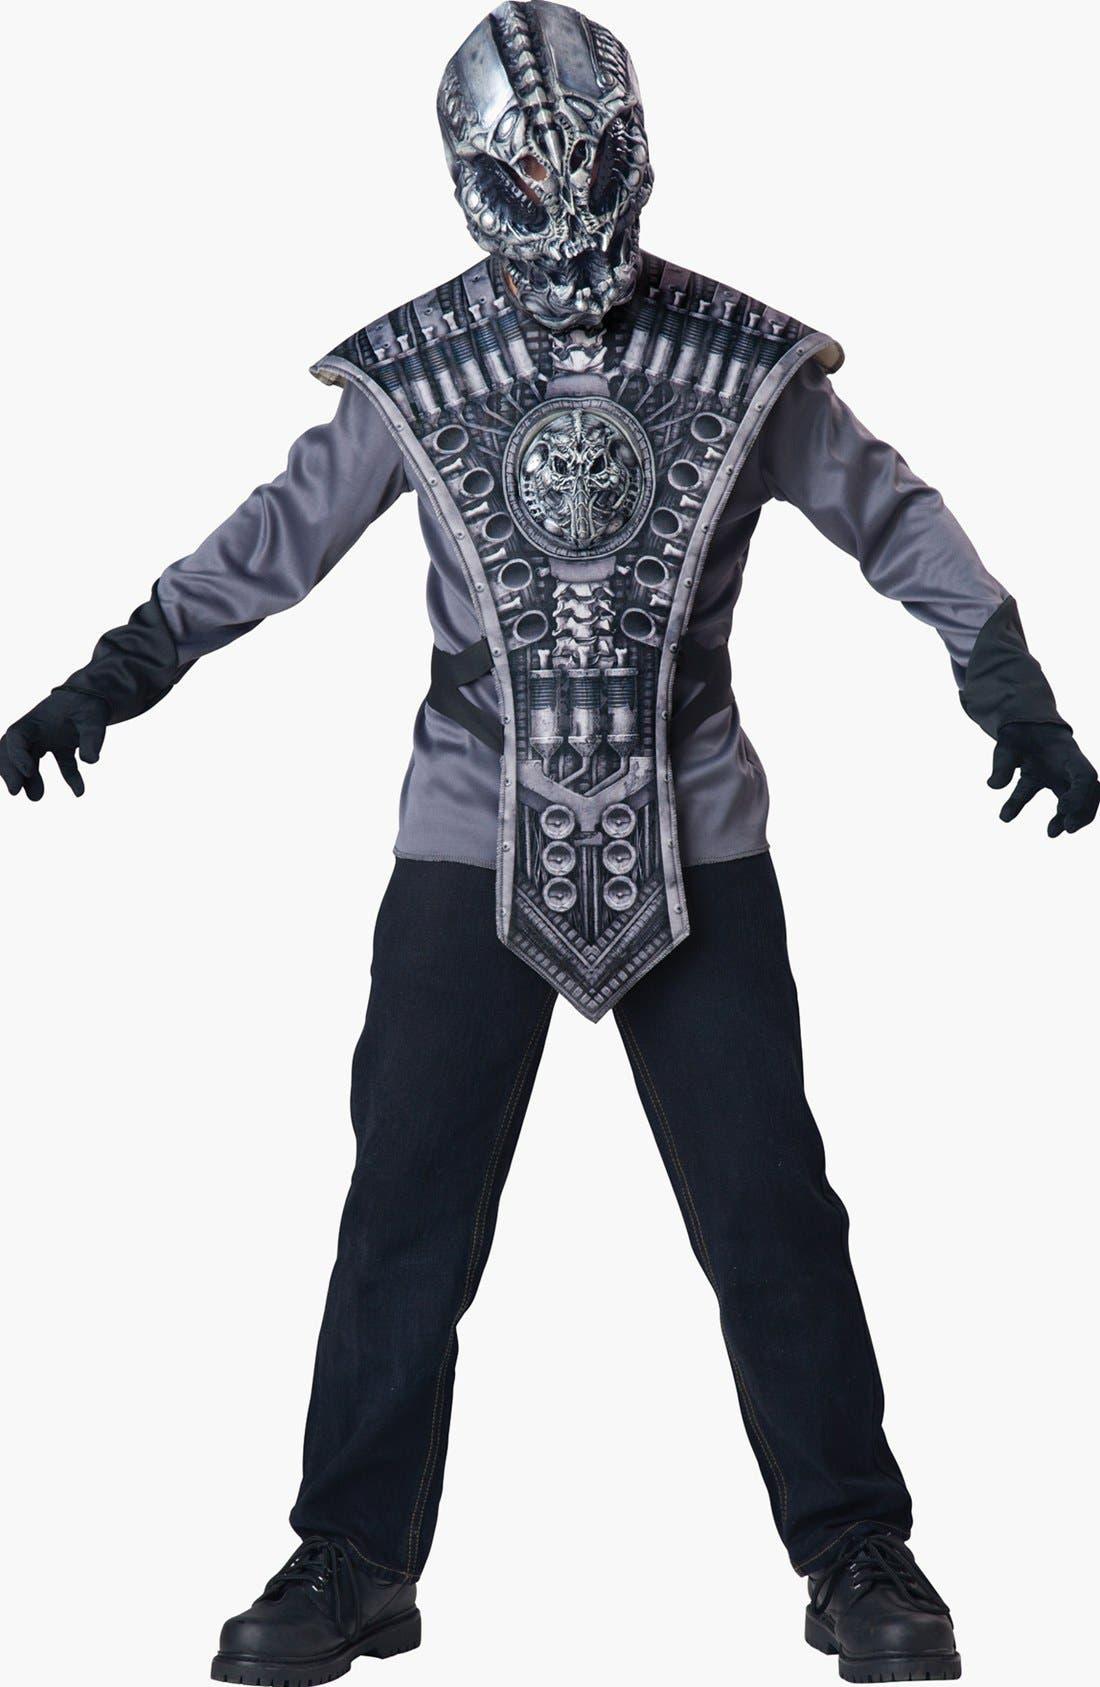 Alternate Image 1 Selected - InCharacter Costumes 'Alien Warrior' Tunic & Mask (Little Boys & Big Boys)